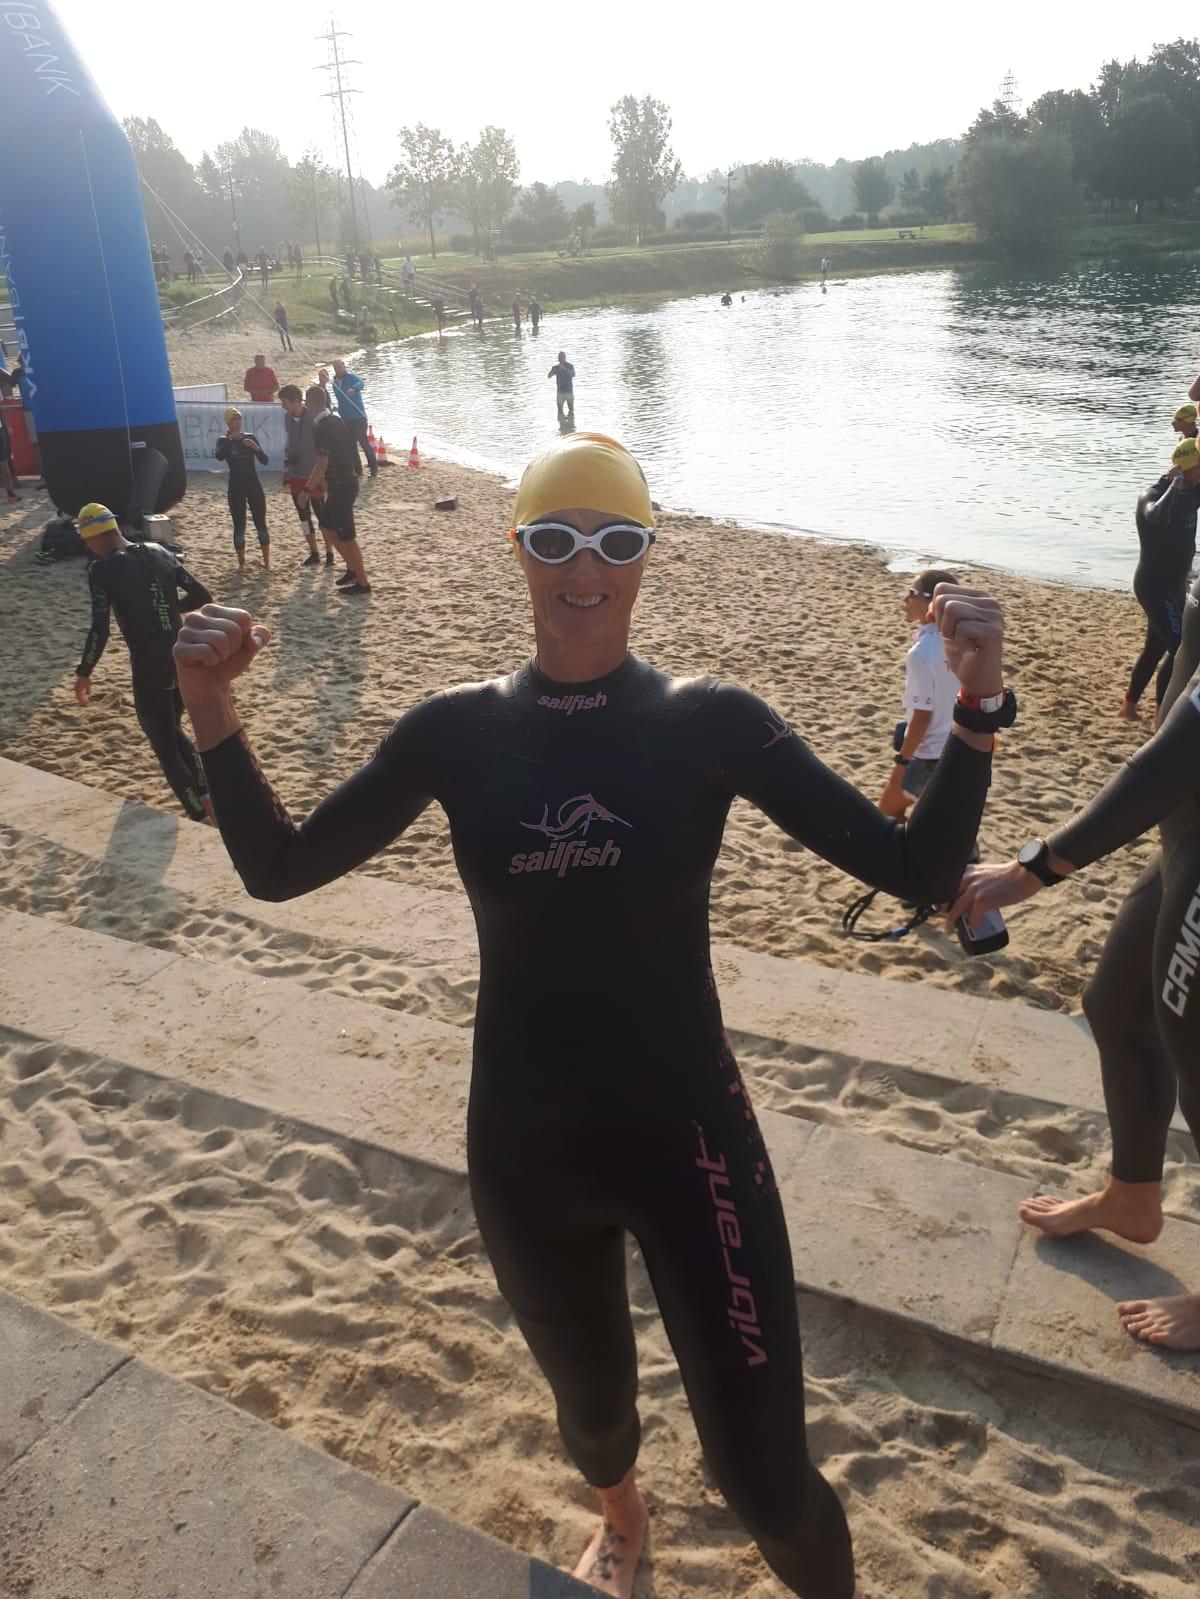 Triathlon -rtr-weiz-WhatsApp-Image-2020-09-13-at-12.58.35-Aloha Tri Traun 2020